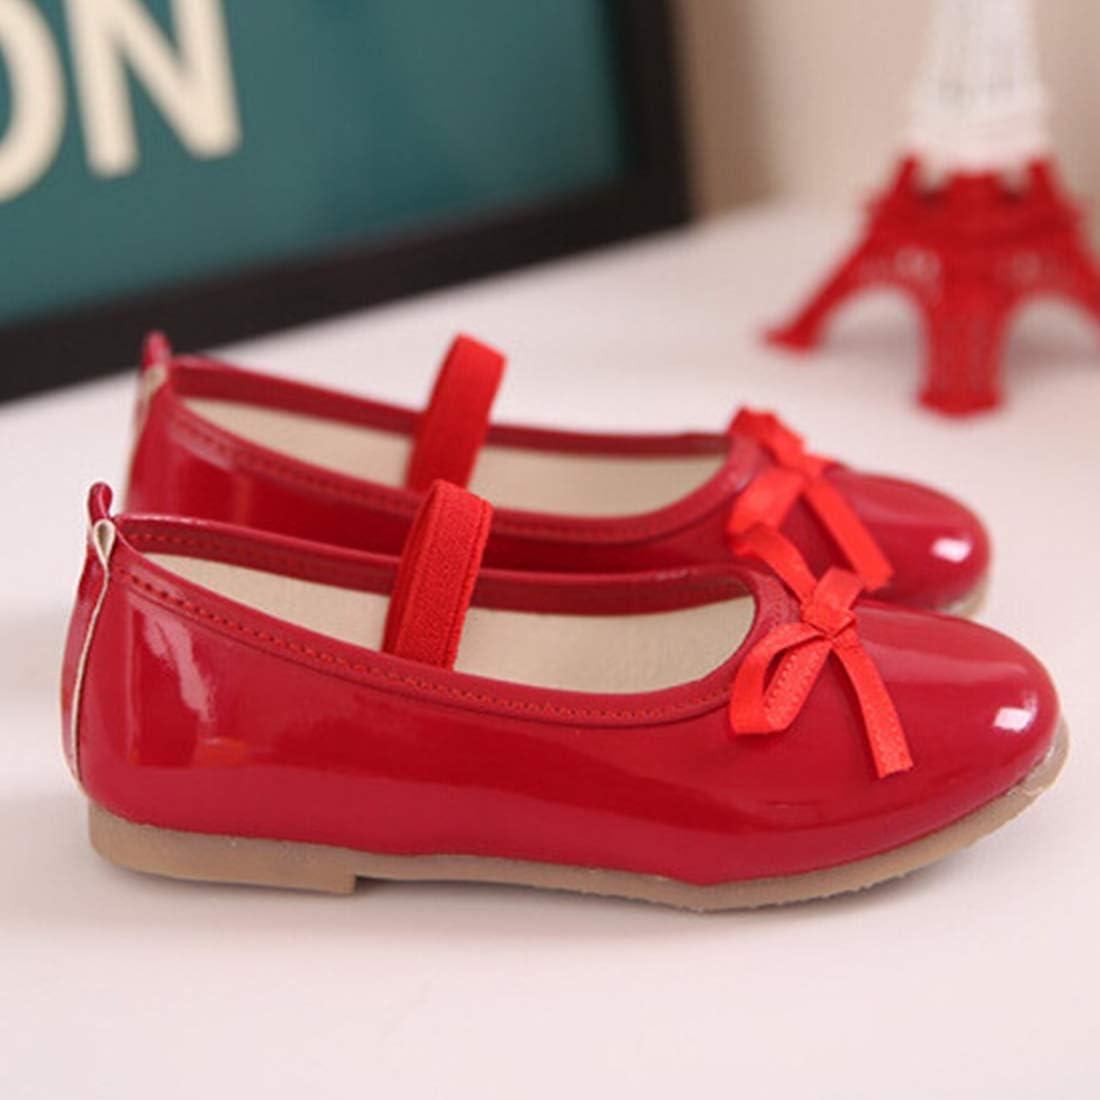 Little//Toddler//Big Kids YANGXING Girls Shoes Ballerina Flat Shoes School Wedding Party Mary Jane Dress Shoes